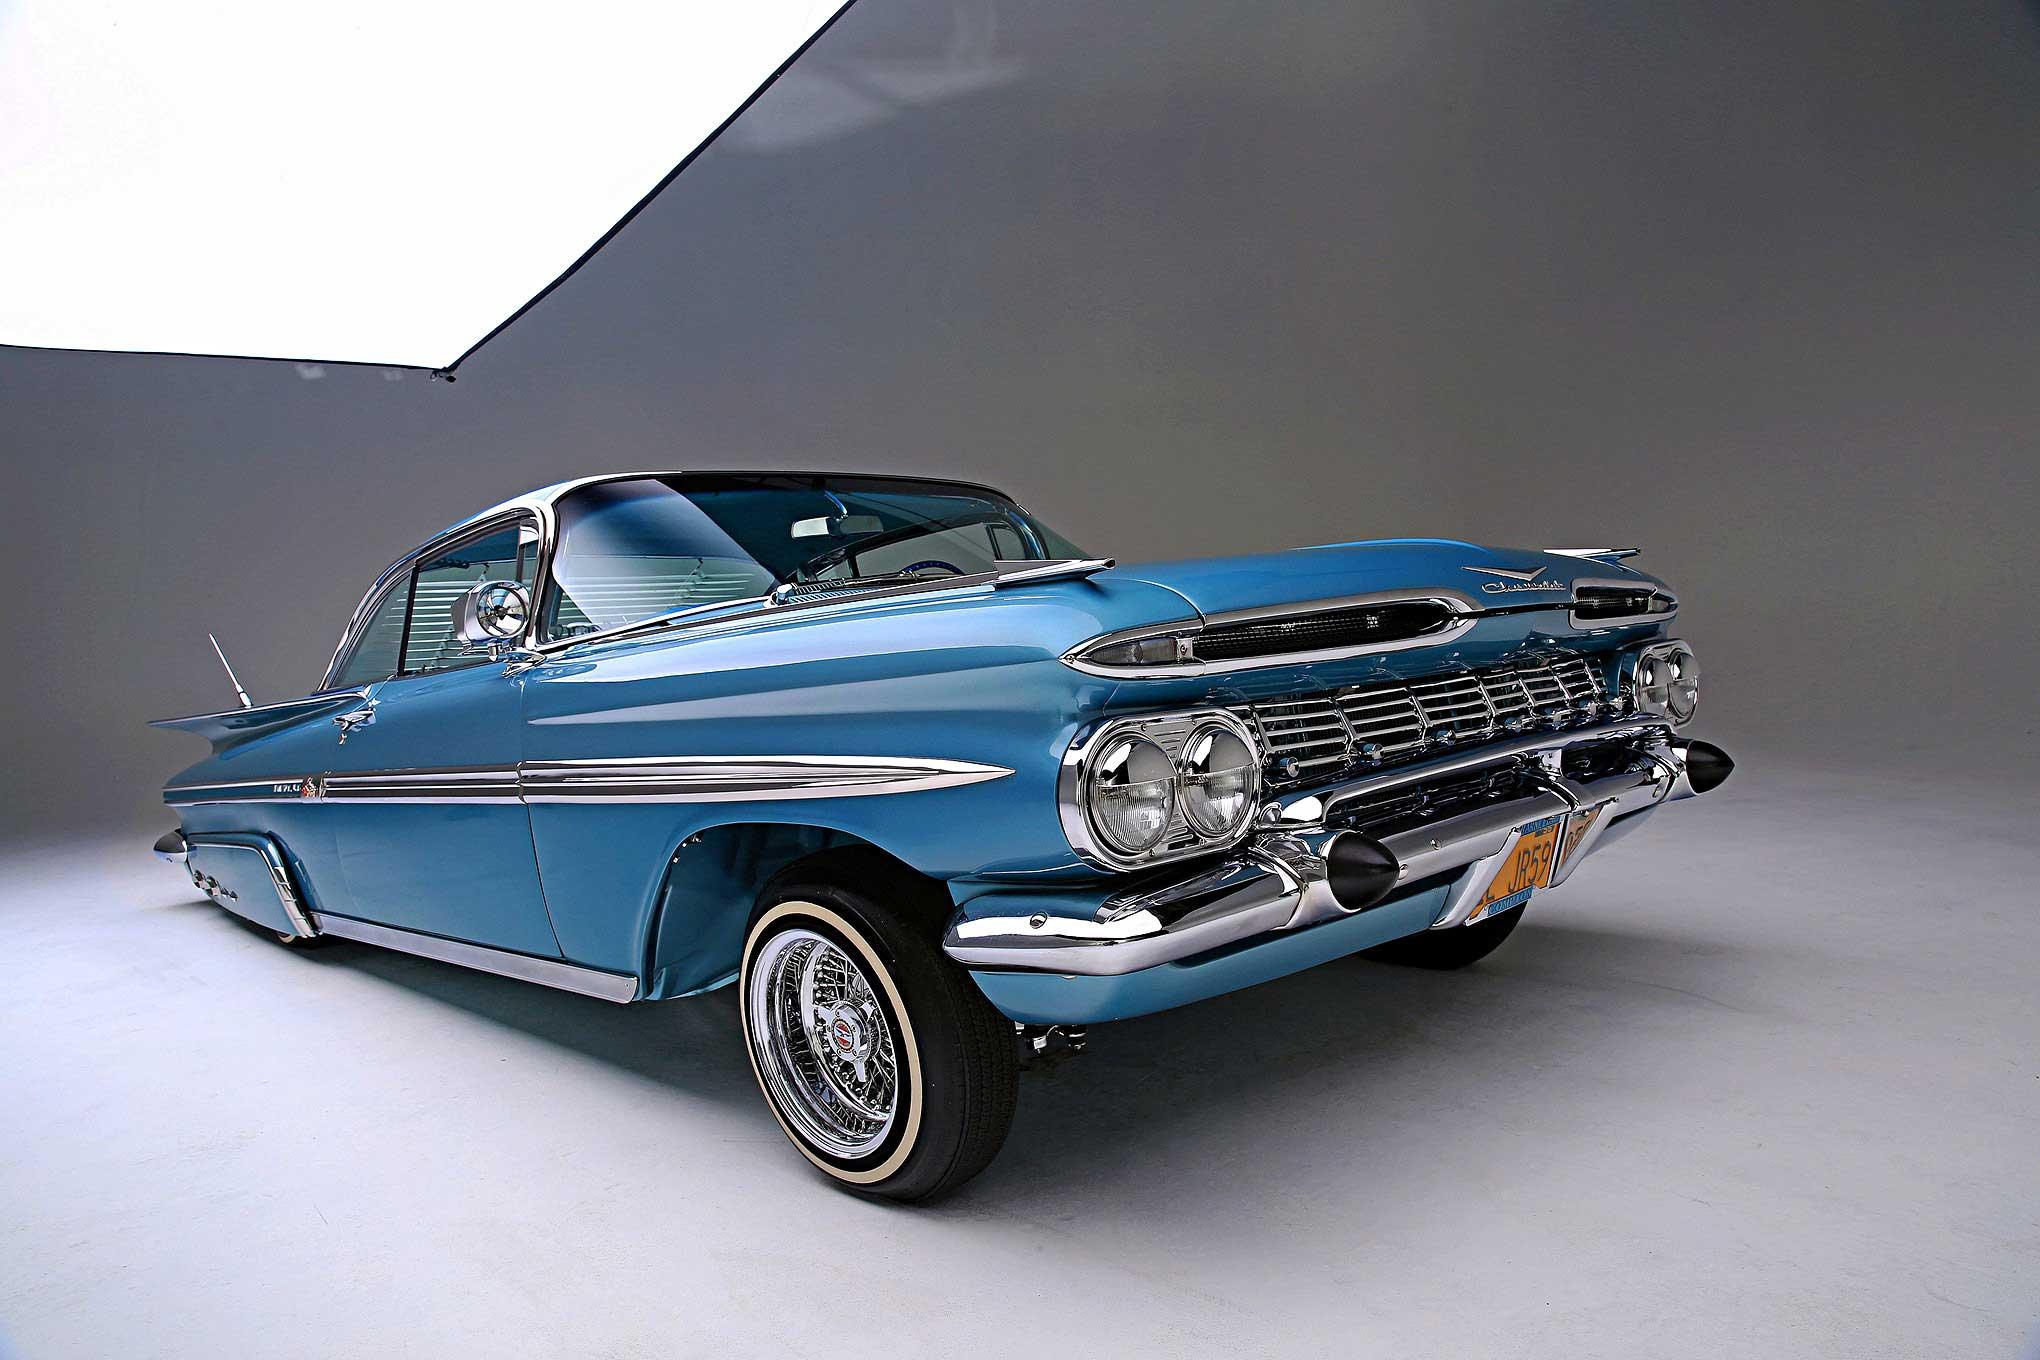 1959 Chevrolet Impala Built In Tijuana Cars T Autronic Eye Circuit Diagram For The 1960 Passenger Car